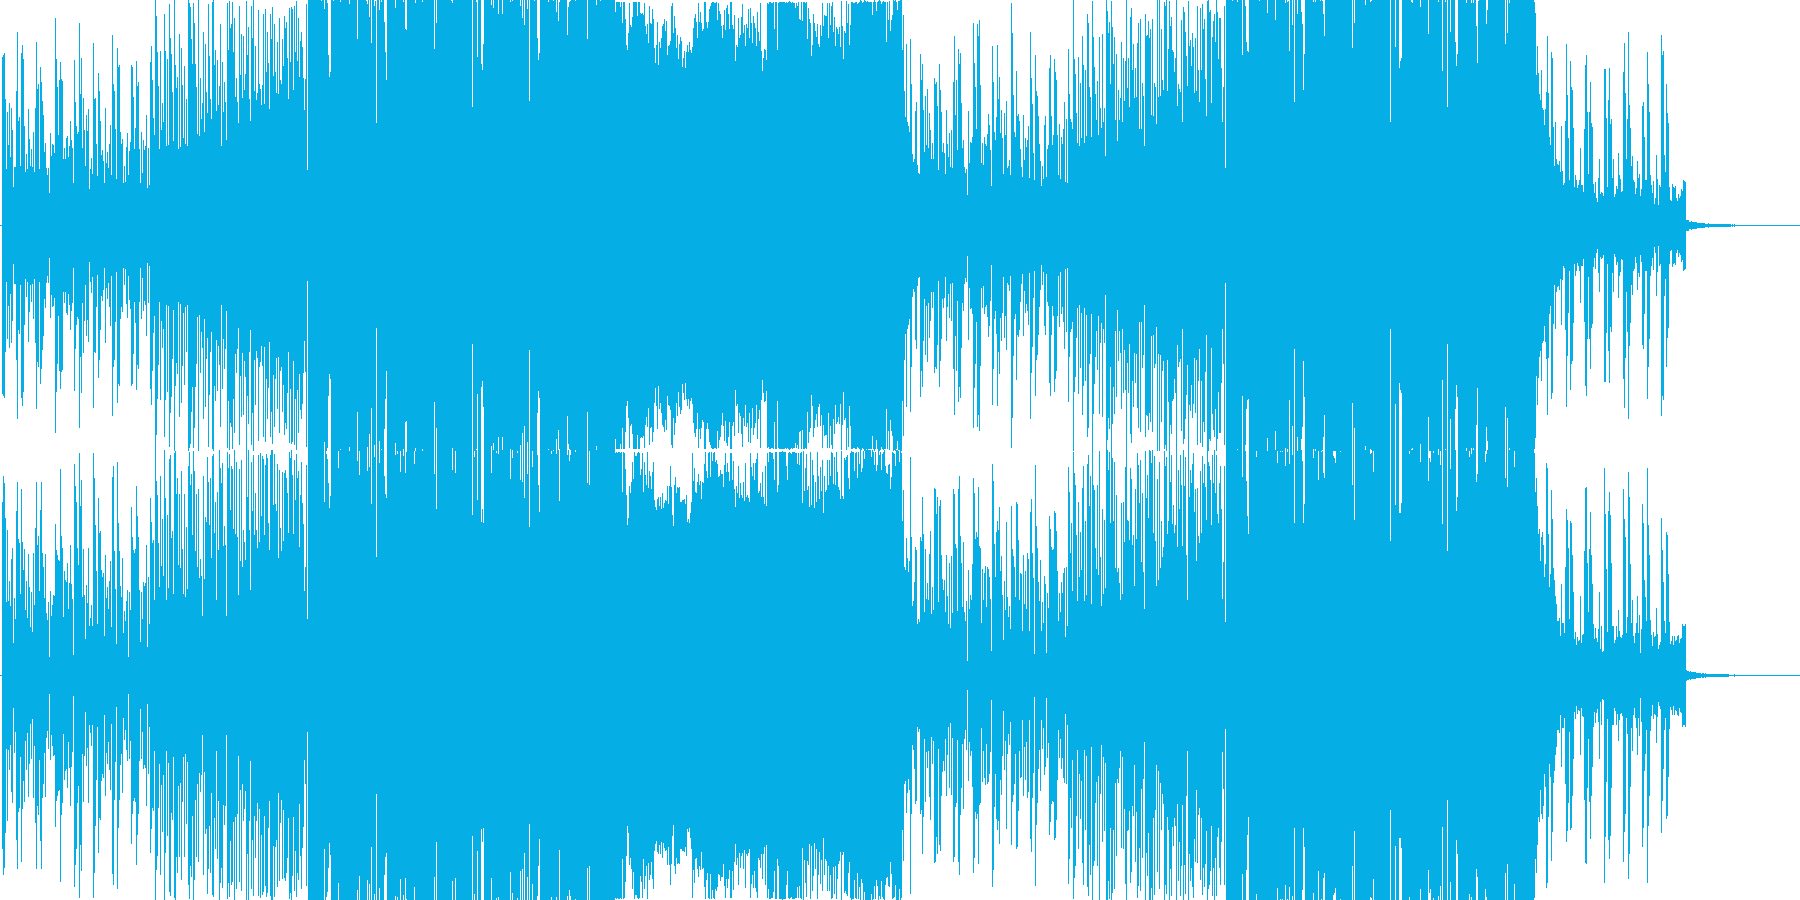 8bitロマンス/ FutureBassの再生済みの波形